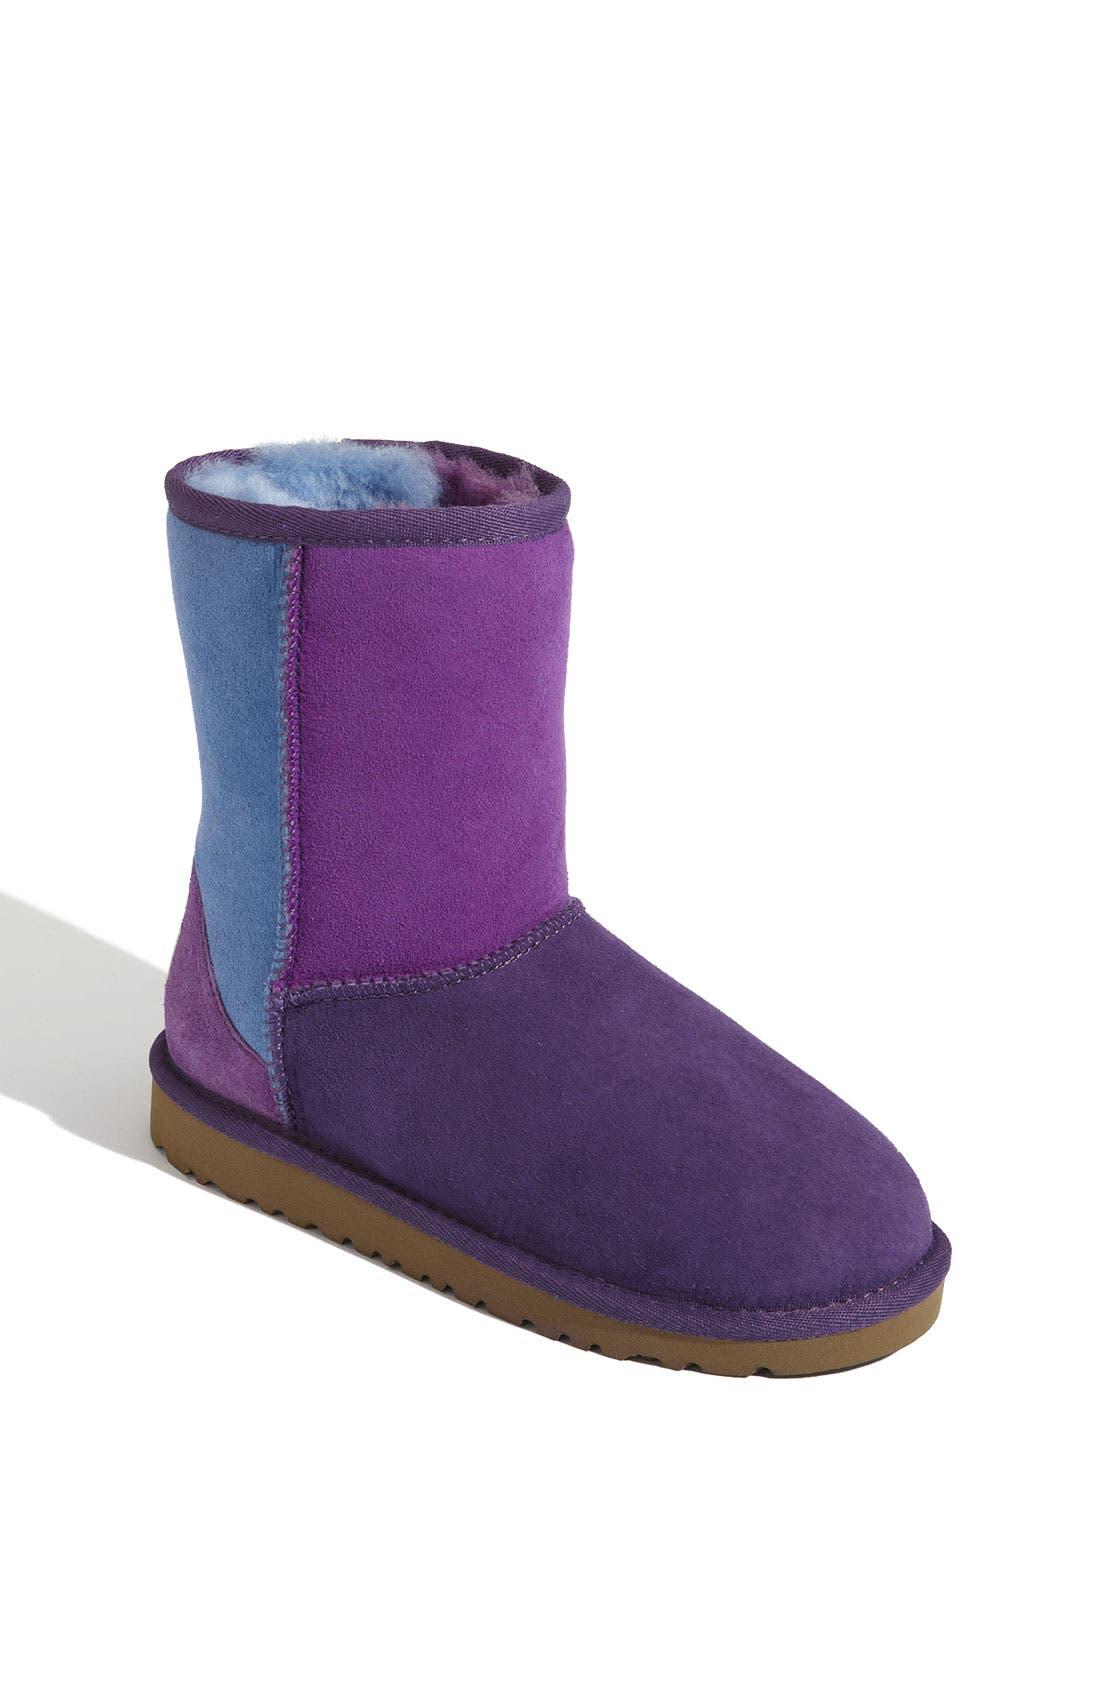 Main Image - UGG® 'Classic Short - Patchwork' Boot (Walker)